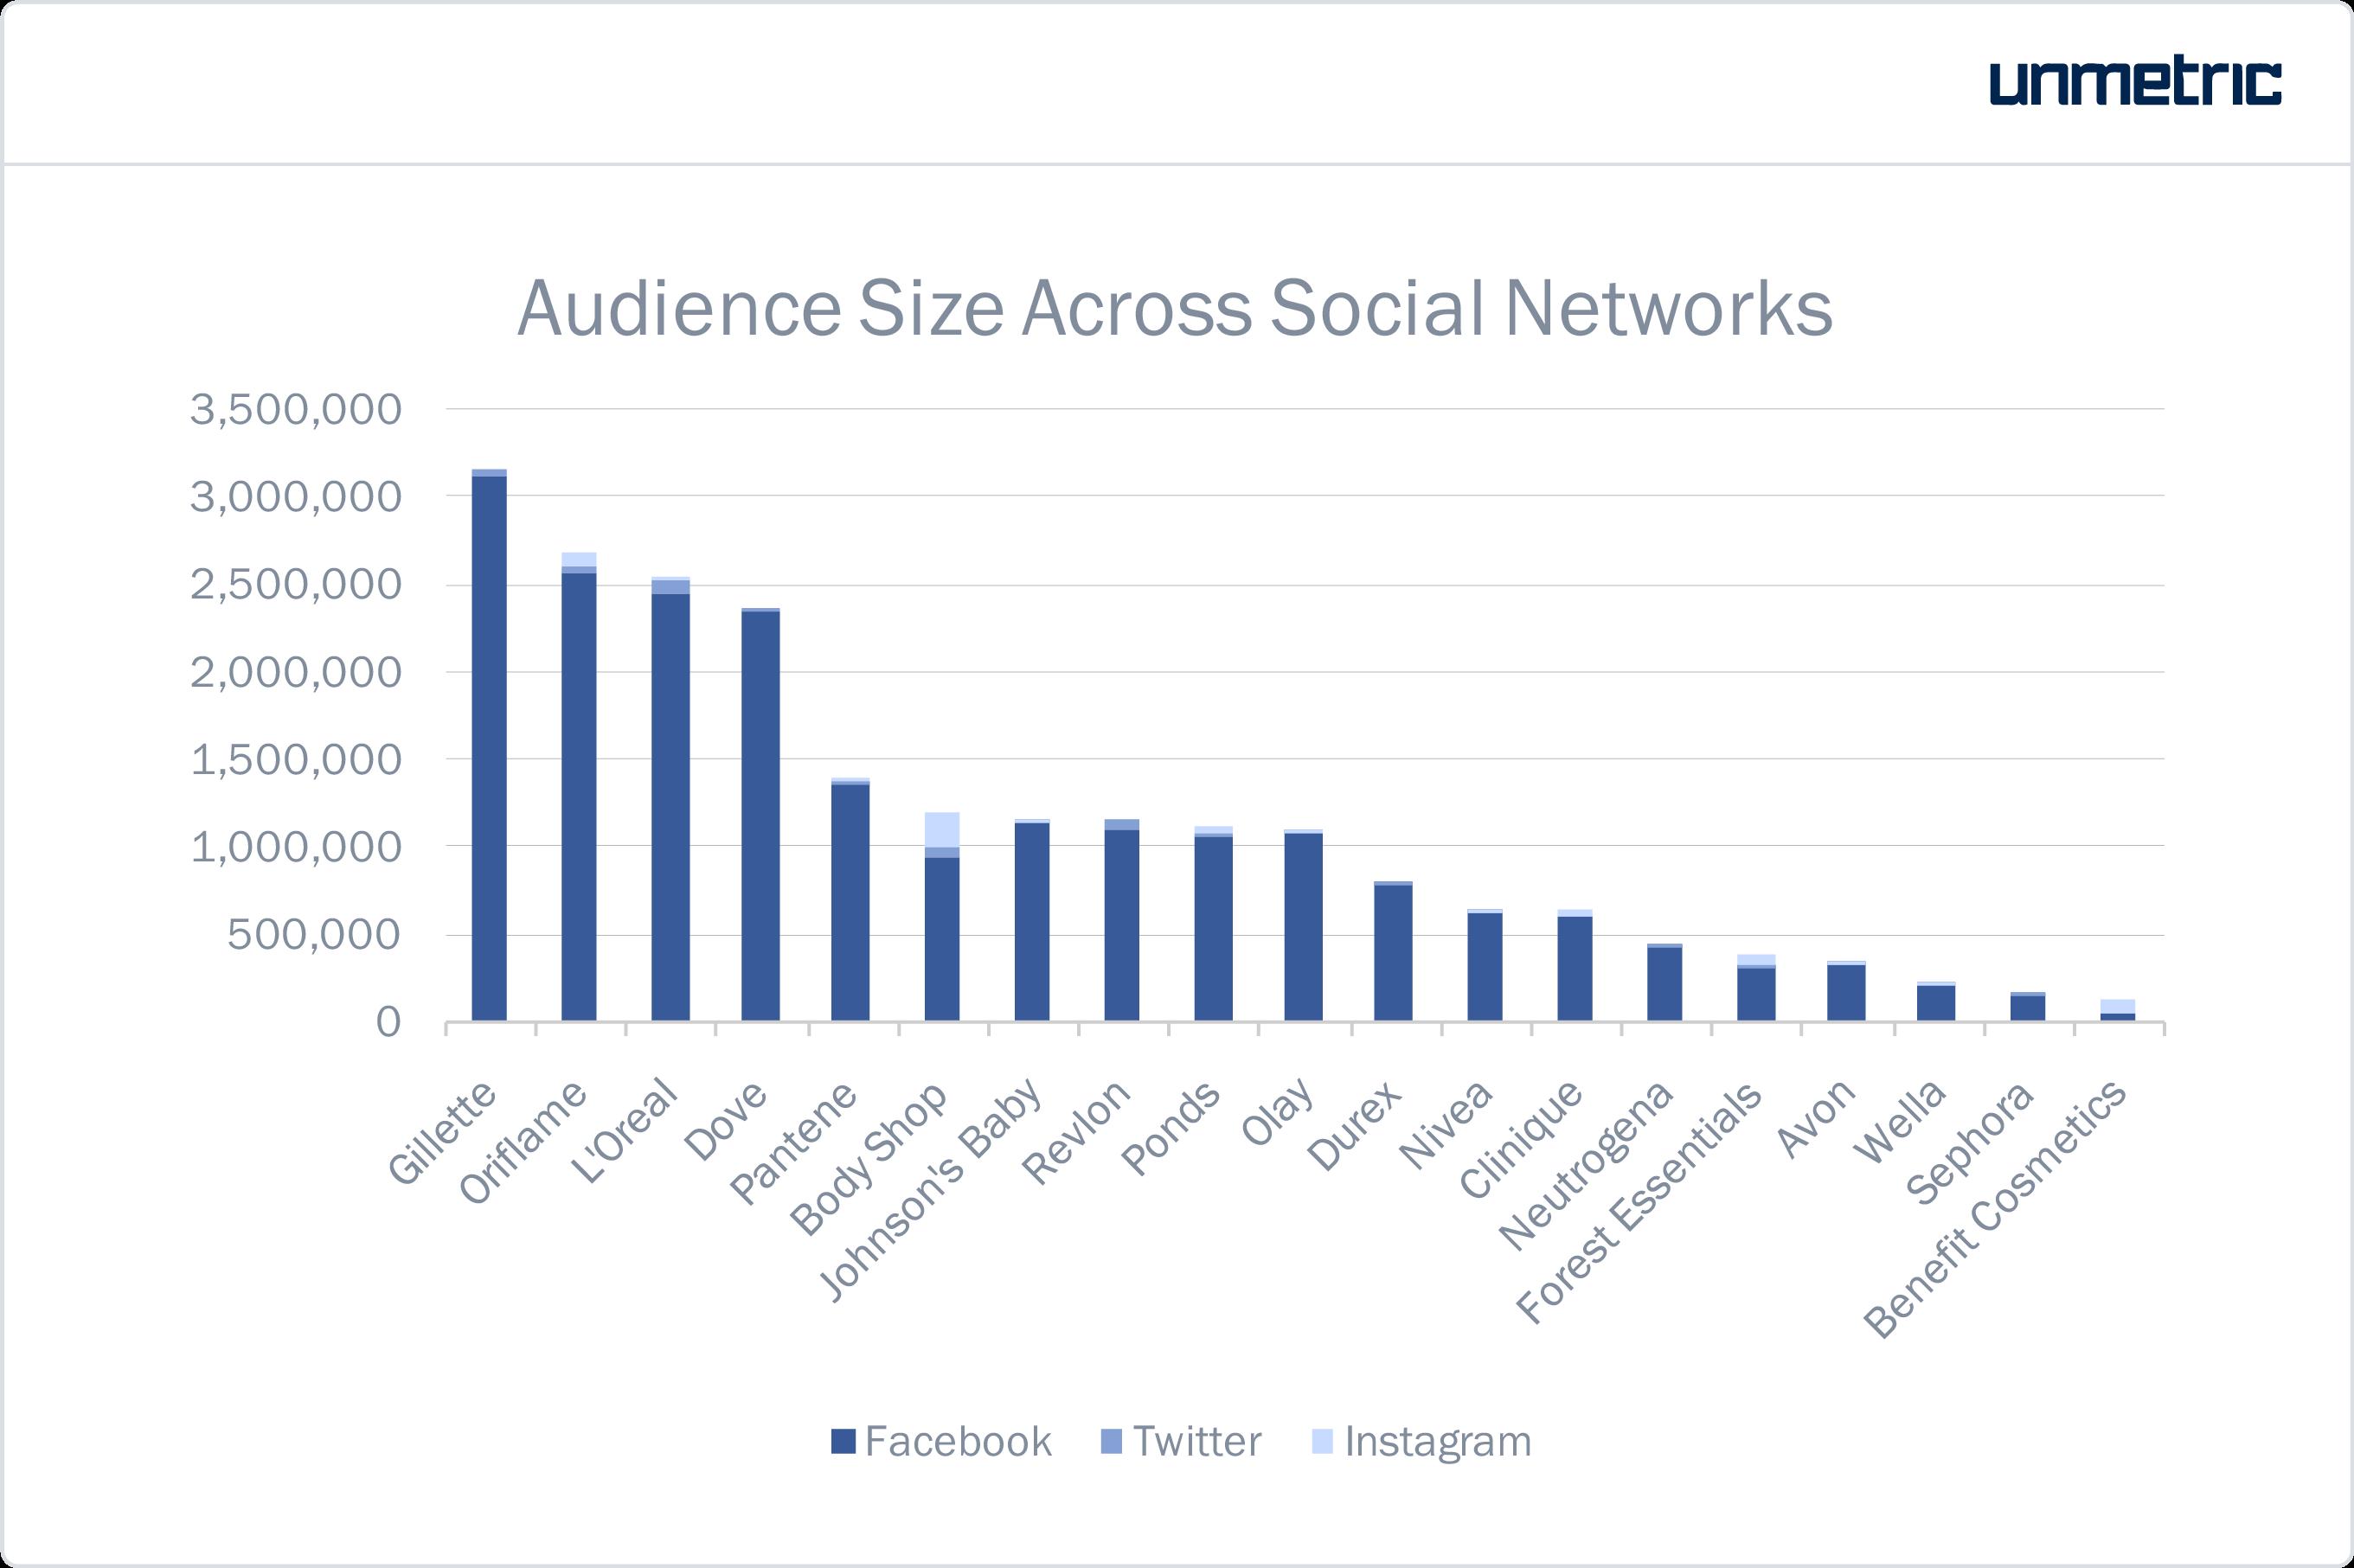 personal care brands in india social media